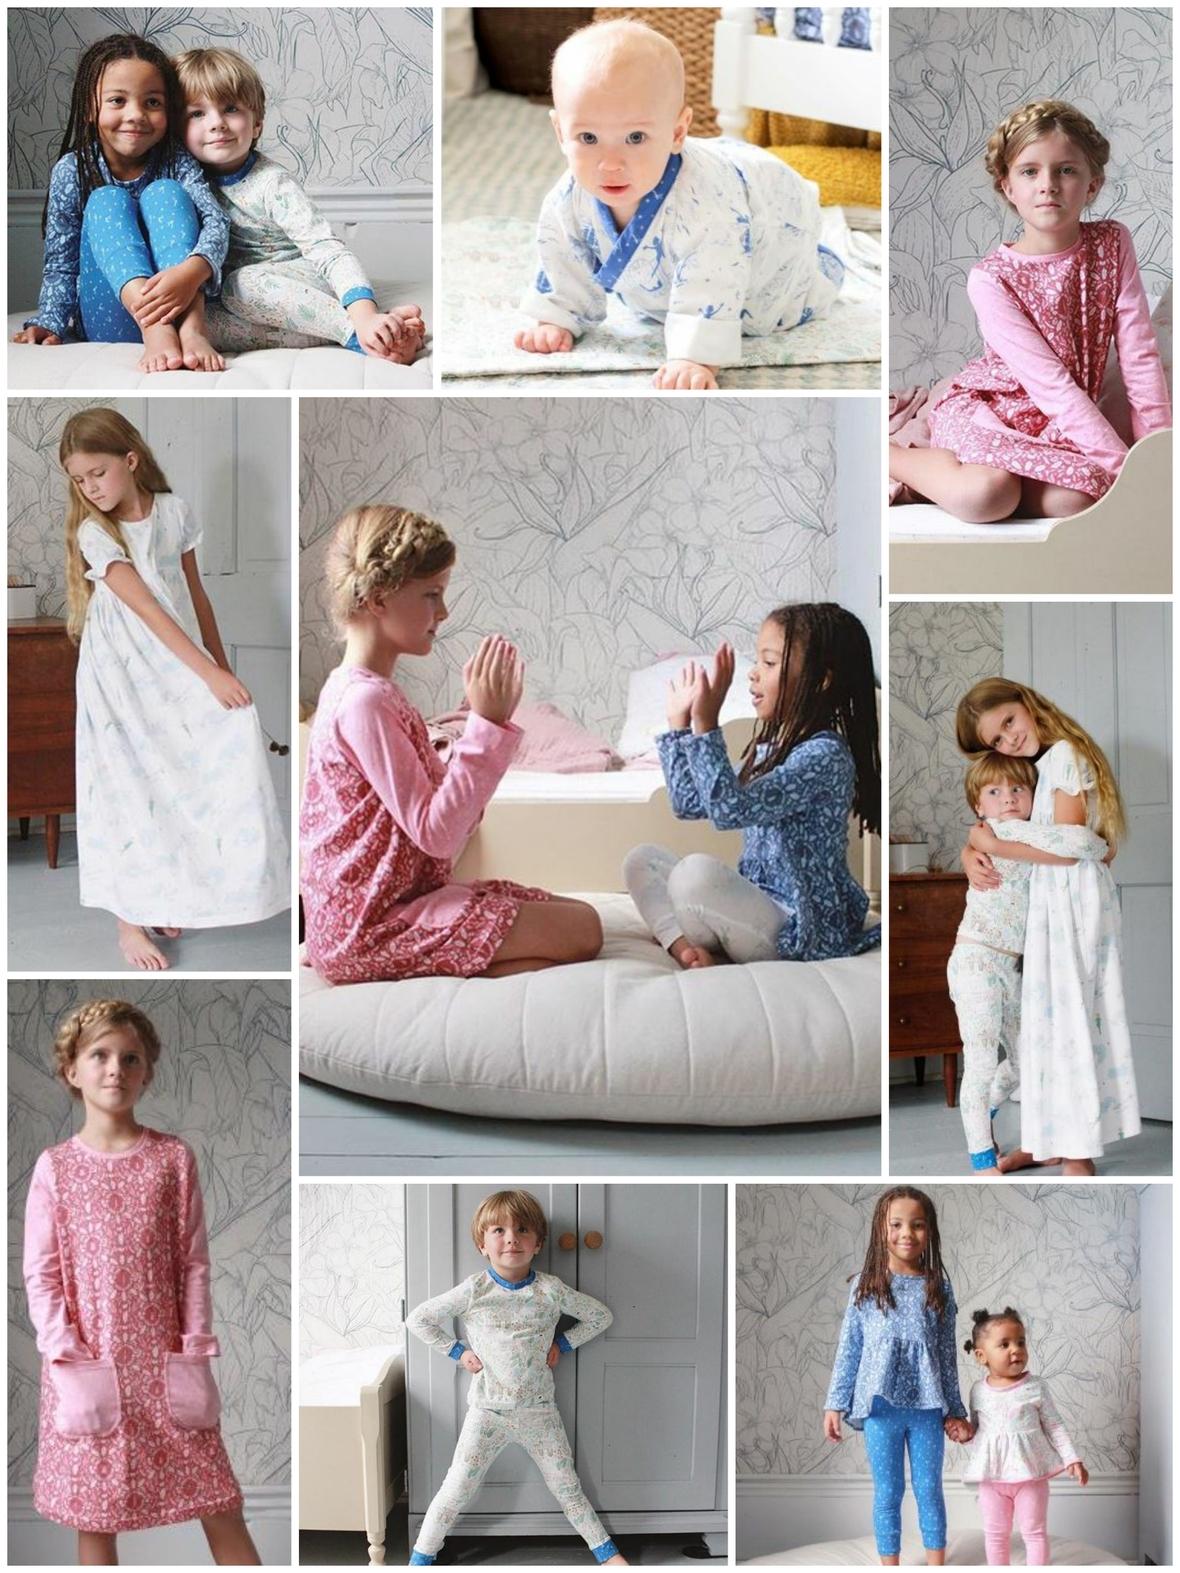 Peter Pan Knit Sewing Inspiration